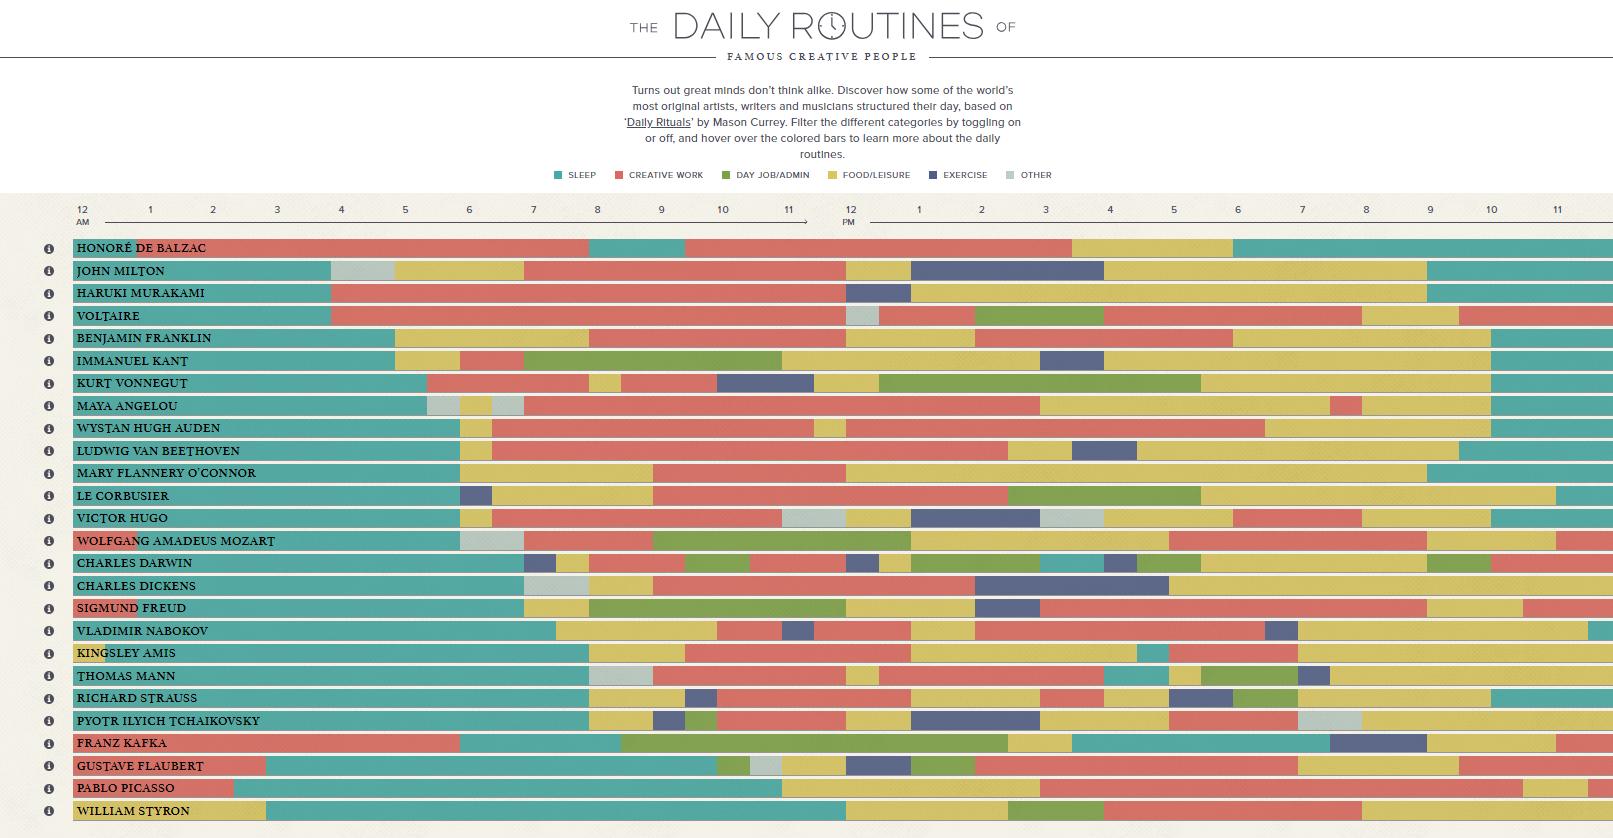 Diagram source:    https://podio.com/site/creative-routines